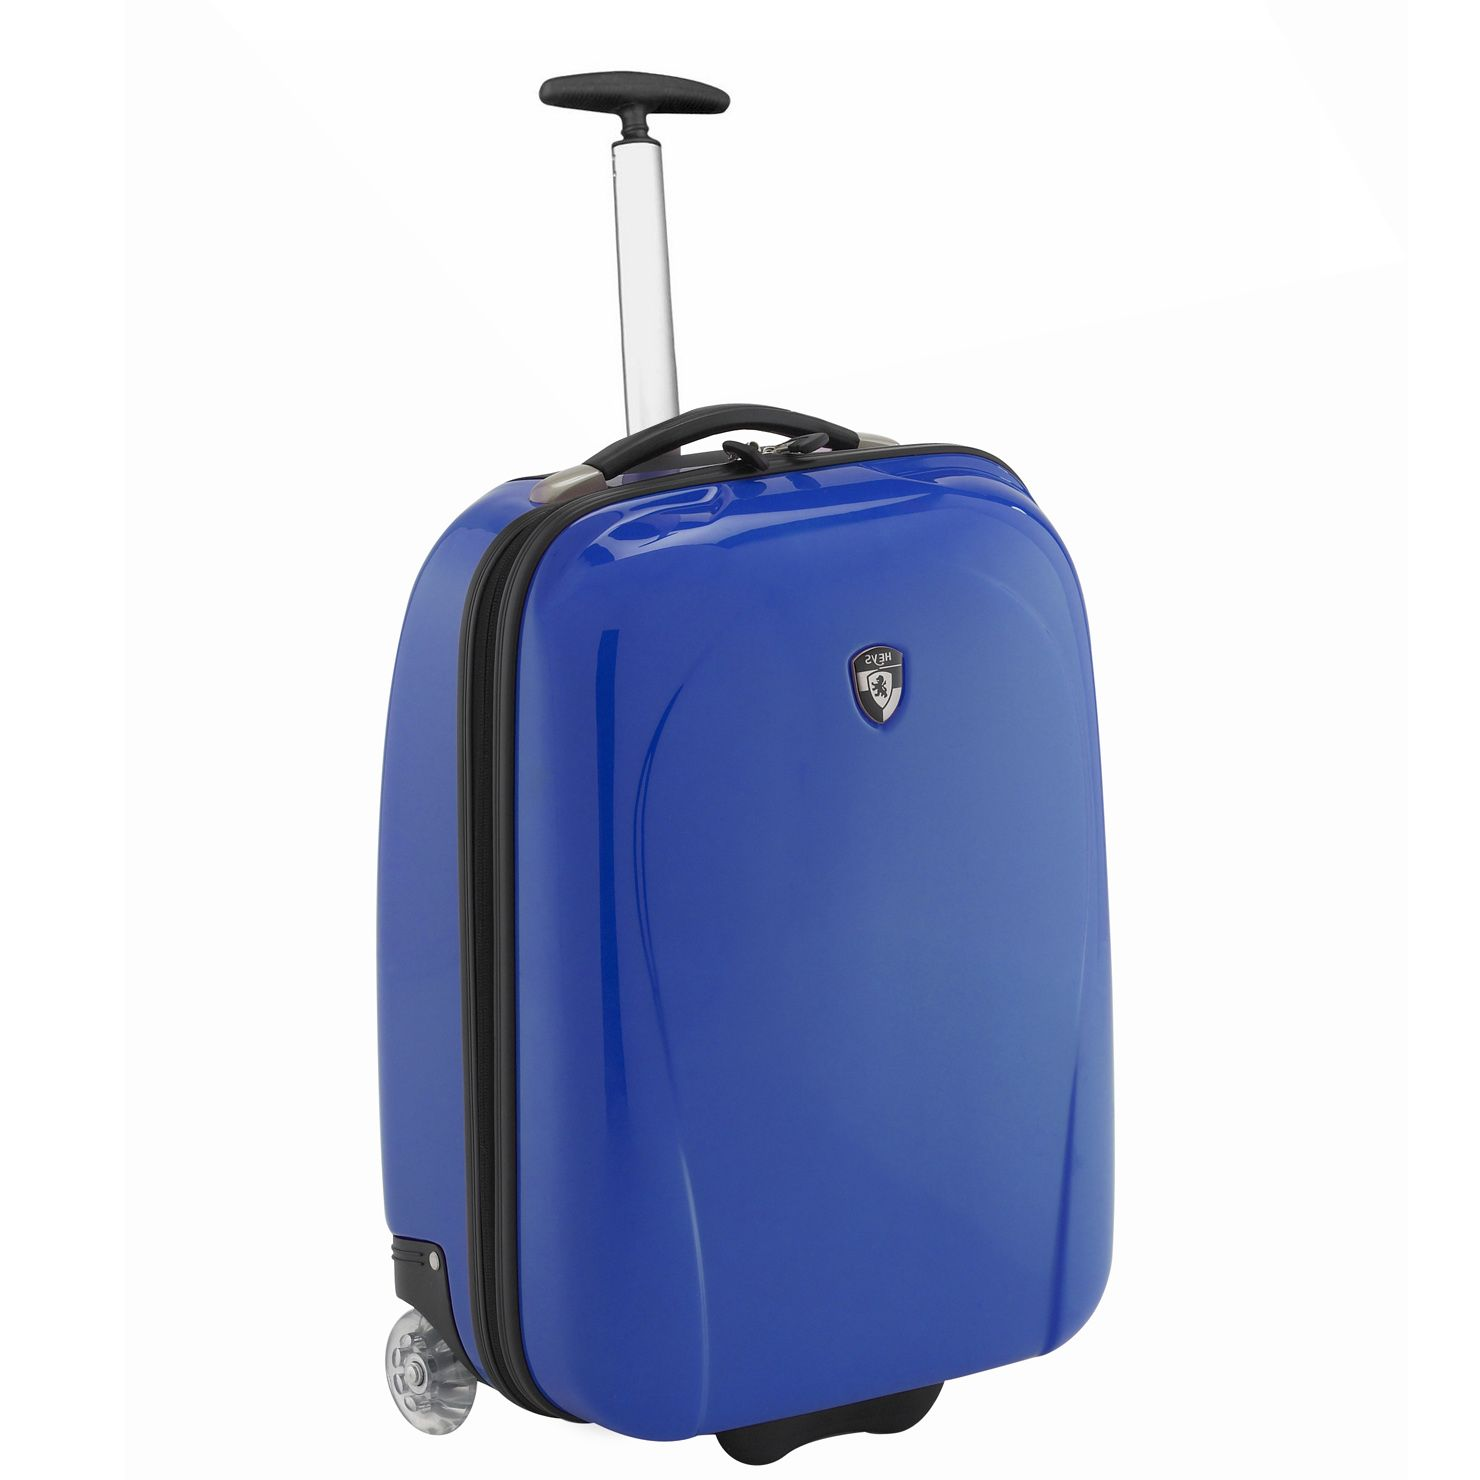 Heys Luggage - RRP £95 / ACHICA Price £50